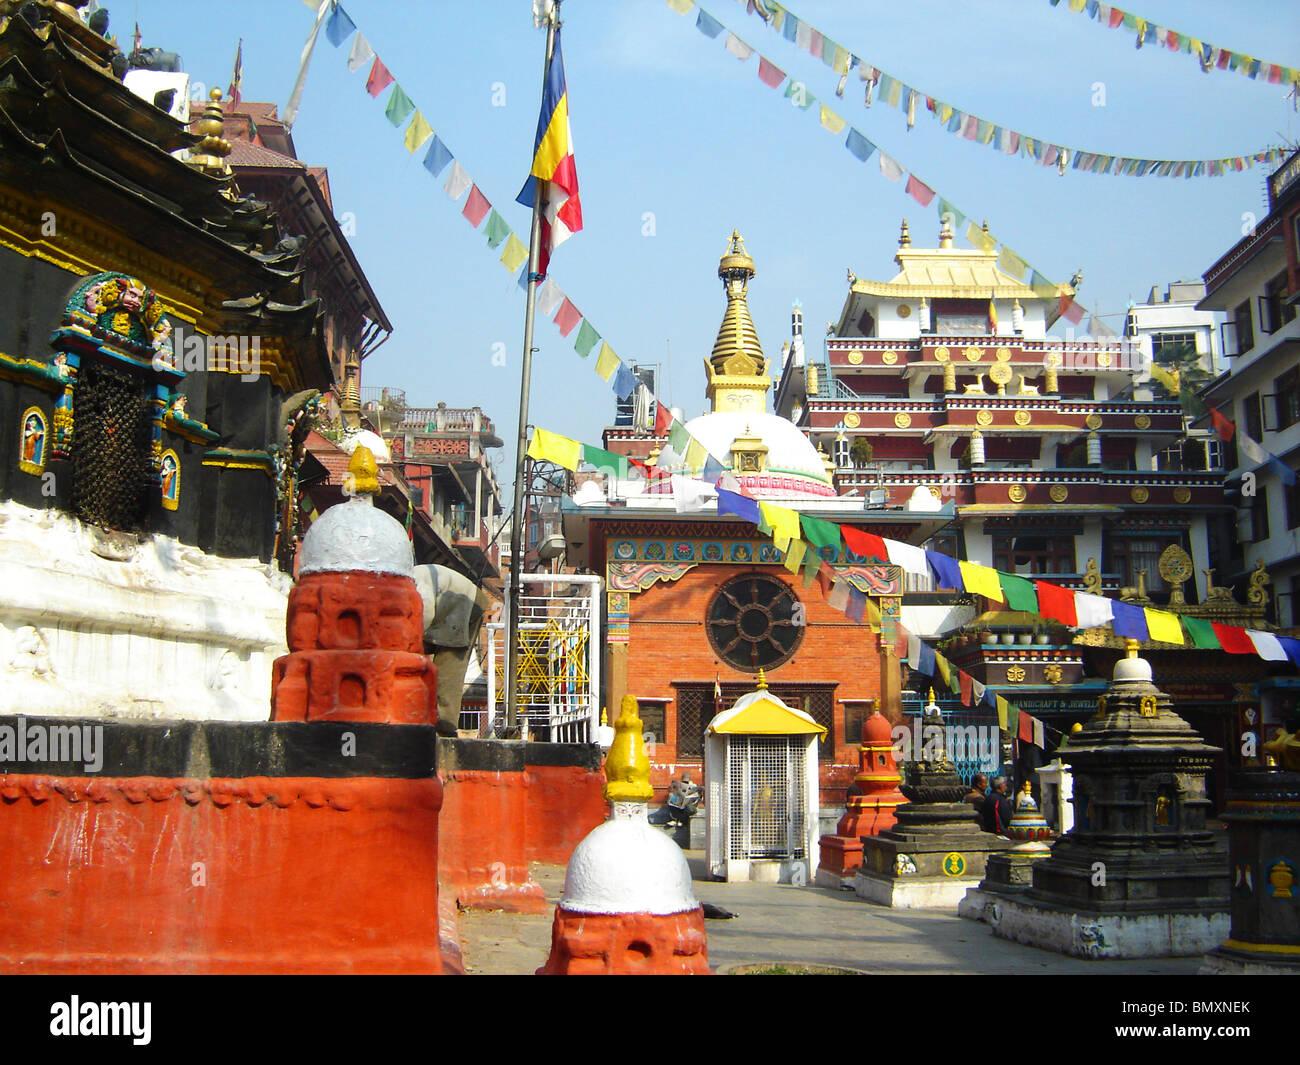 a wat temple in katmandu with prayer flags - Stock Image